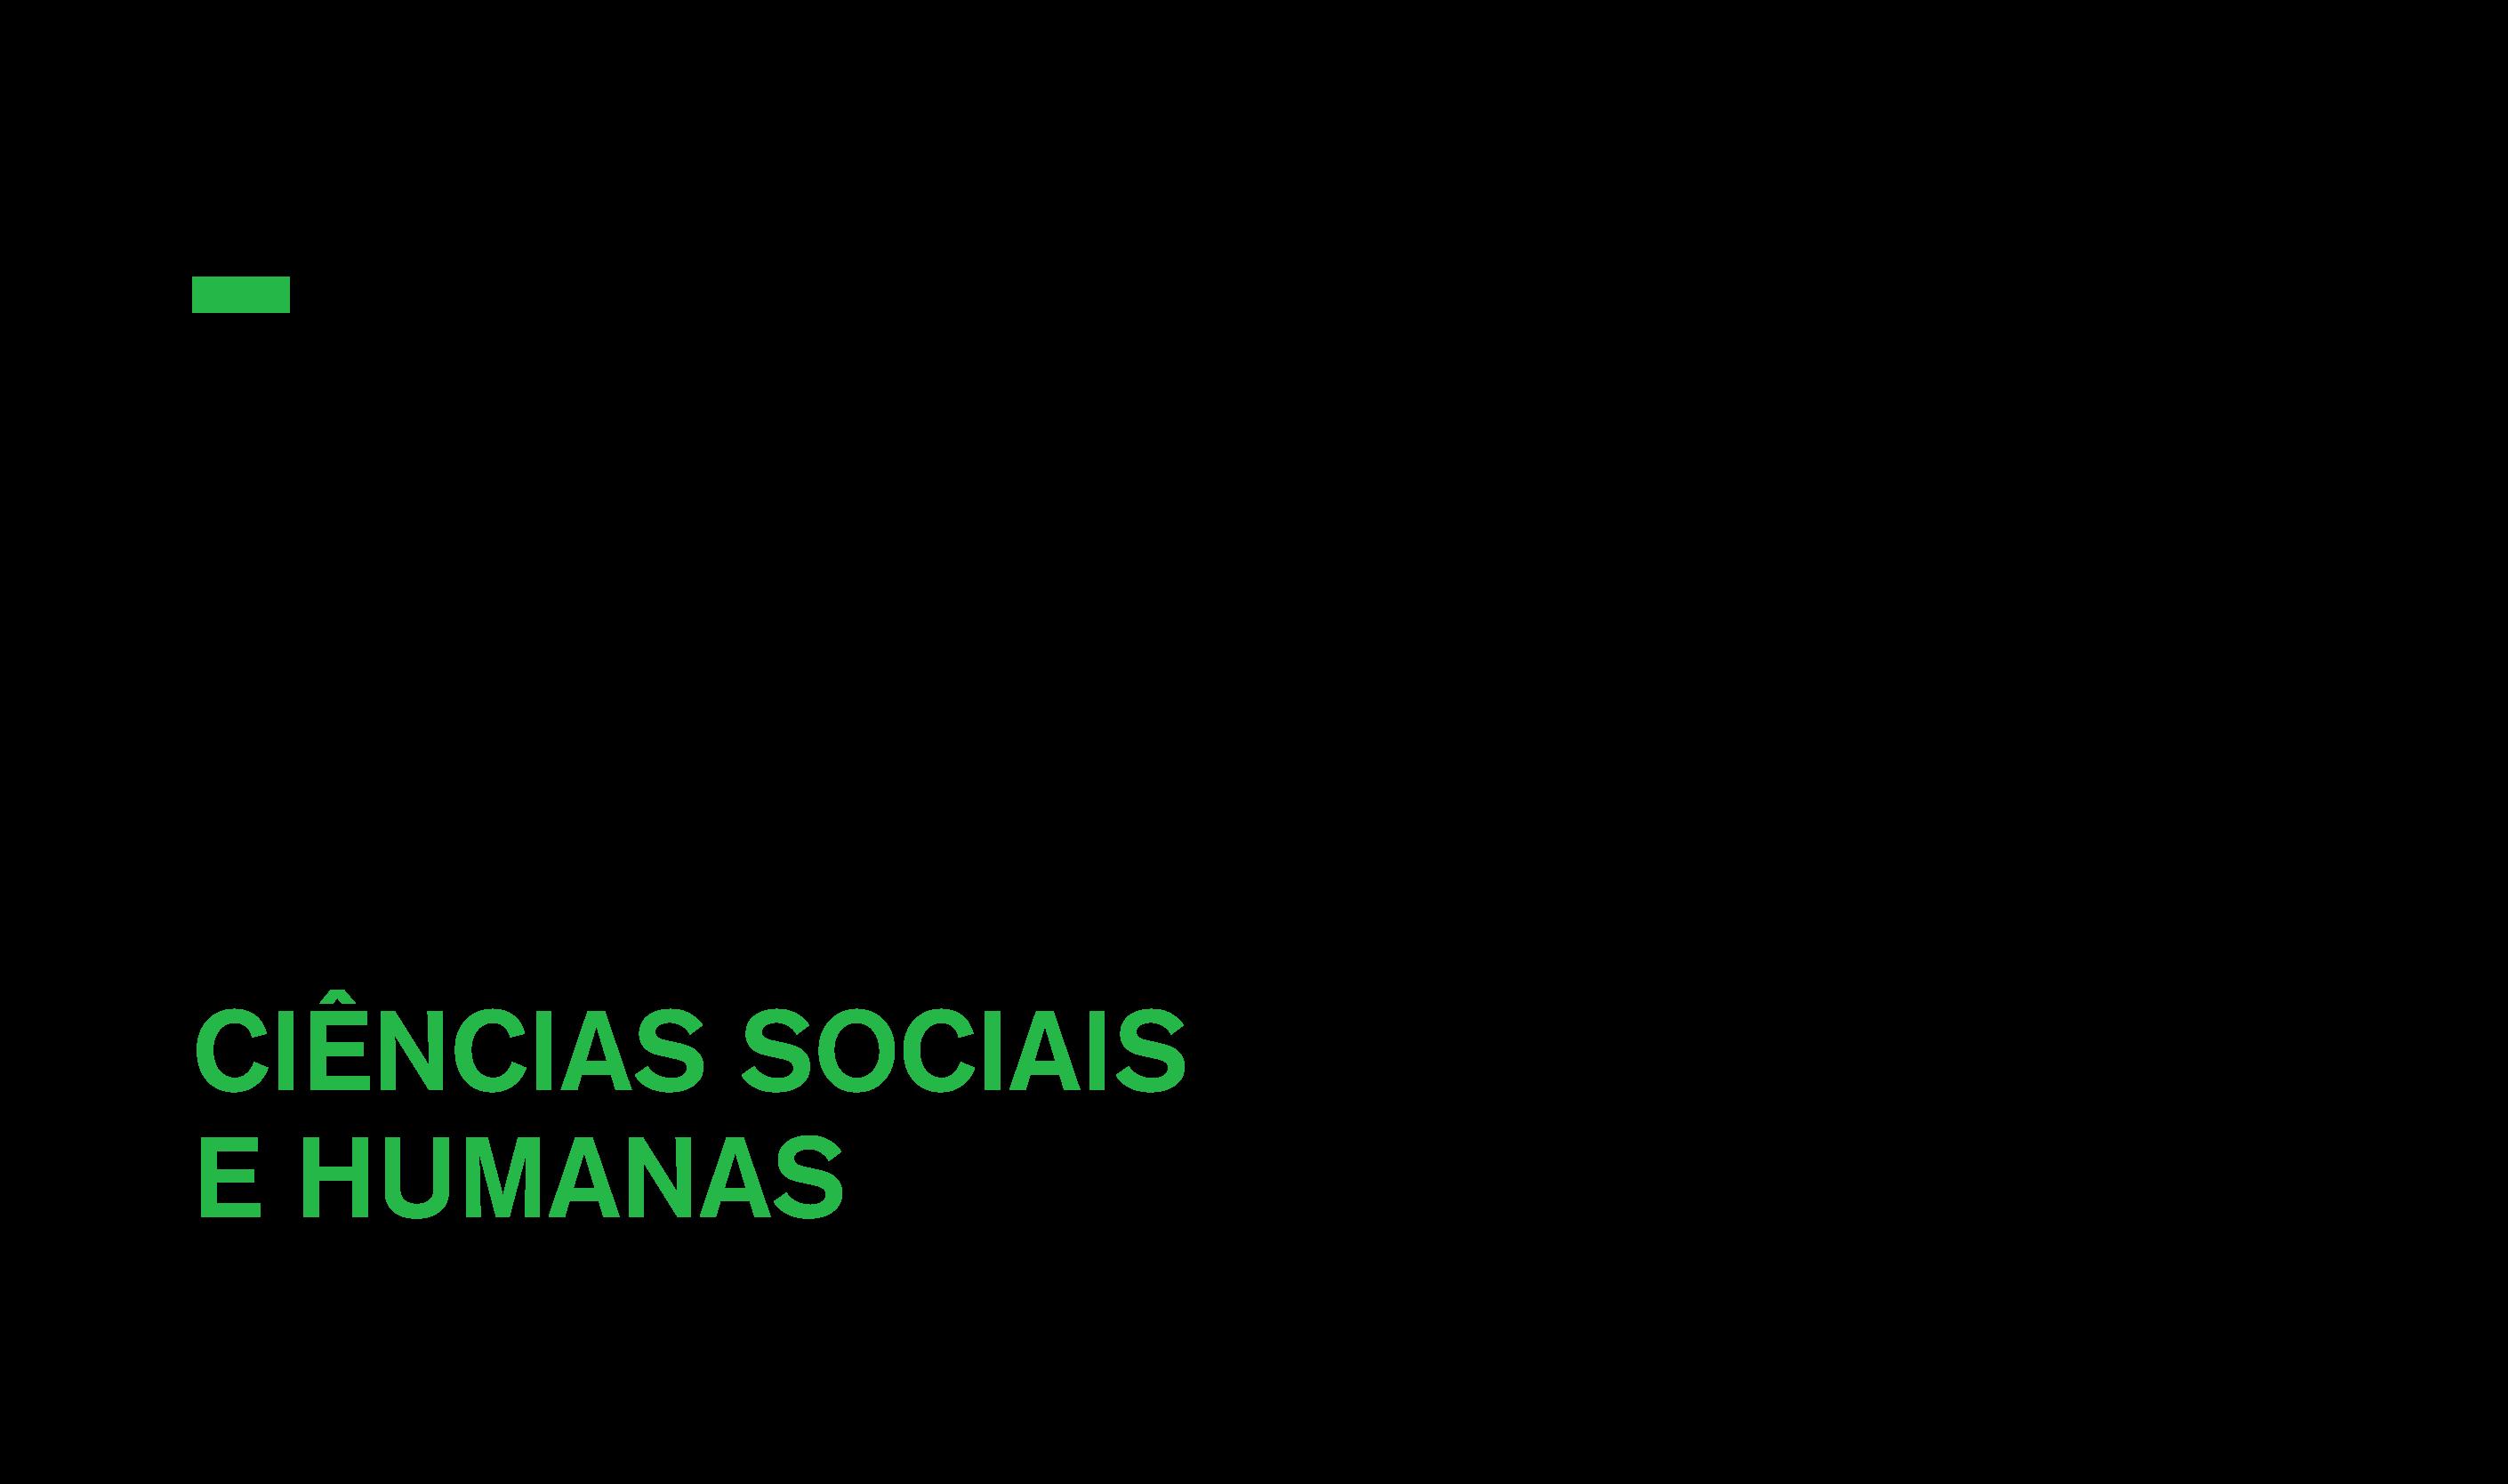 Logo School of Social Sciences and Humanities, ISCTE - Instituto Universitário de Lisboa